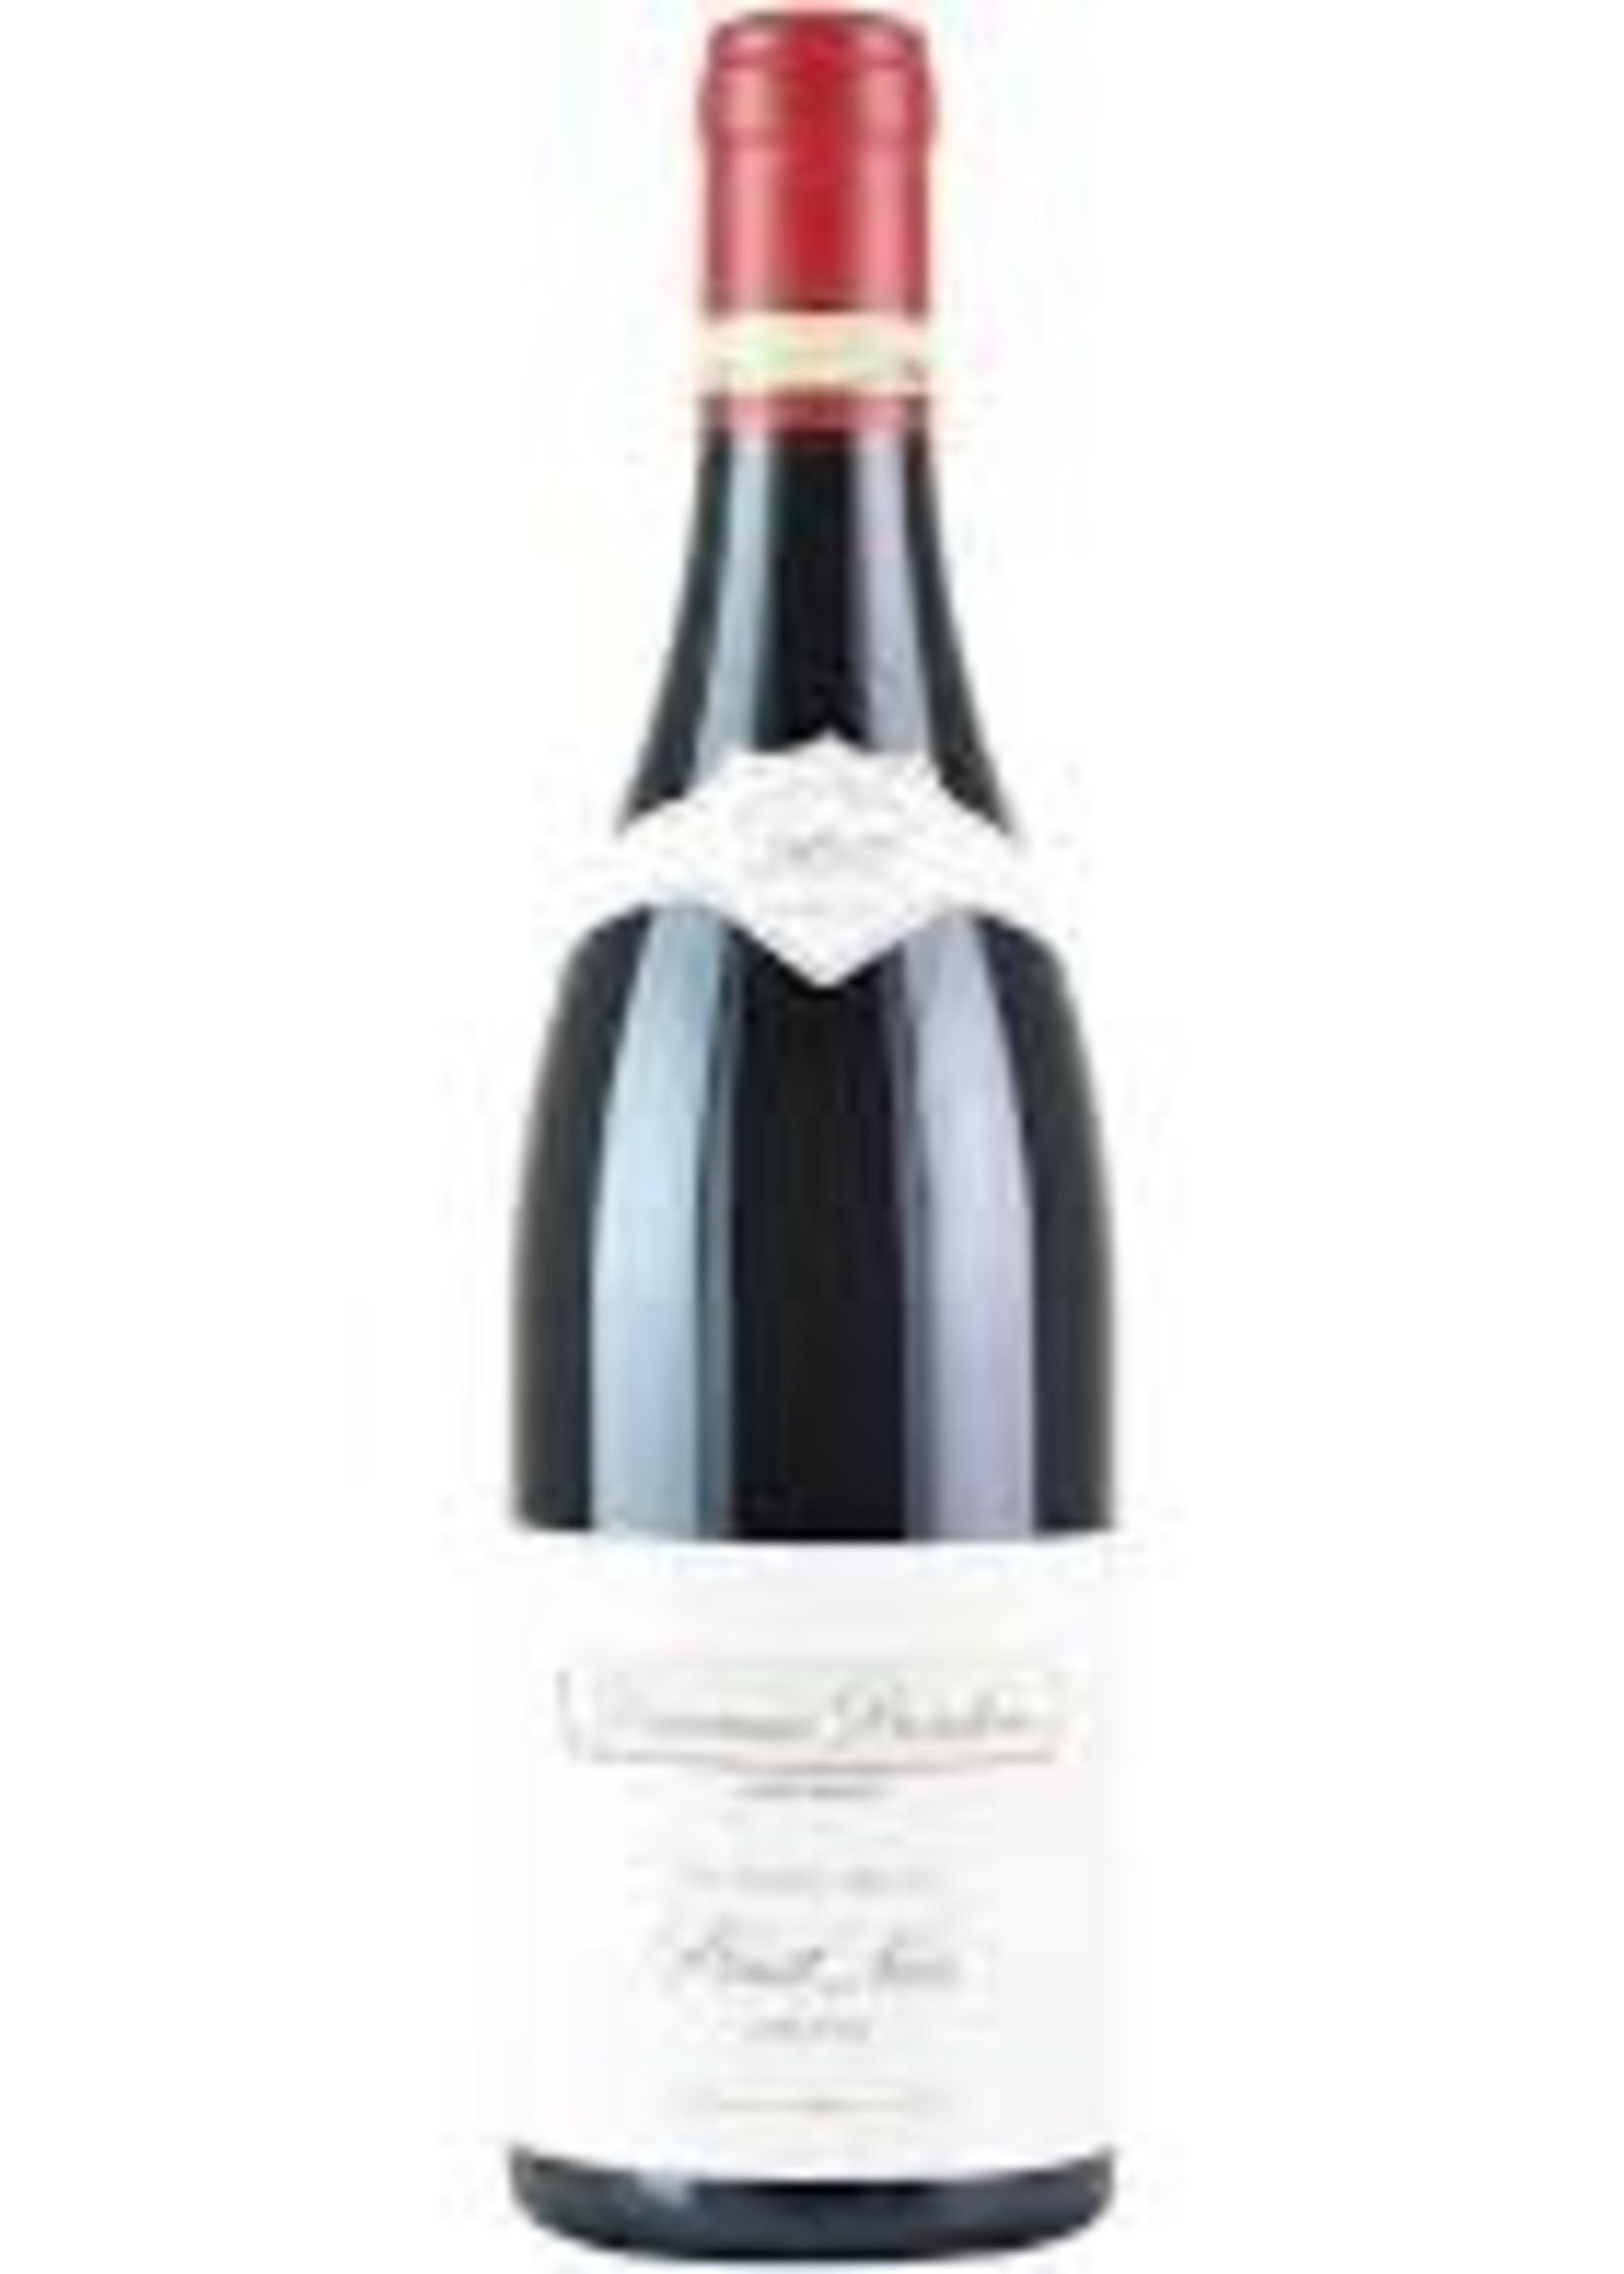 Domaine Drouhin 2017 Pinot Noir Oregon 750ml